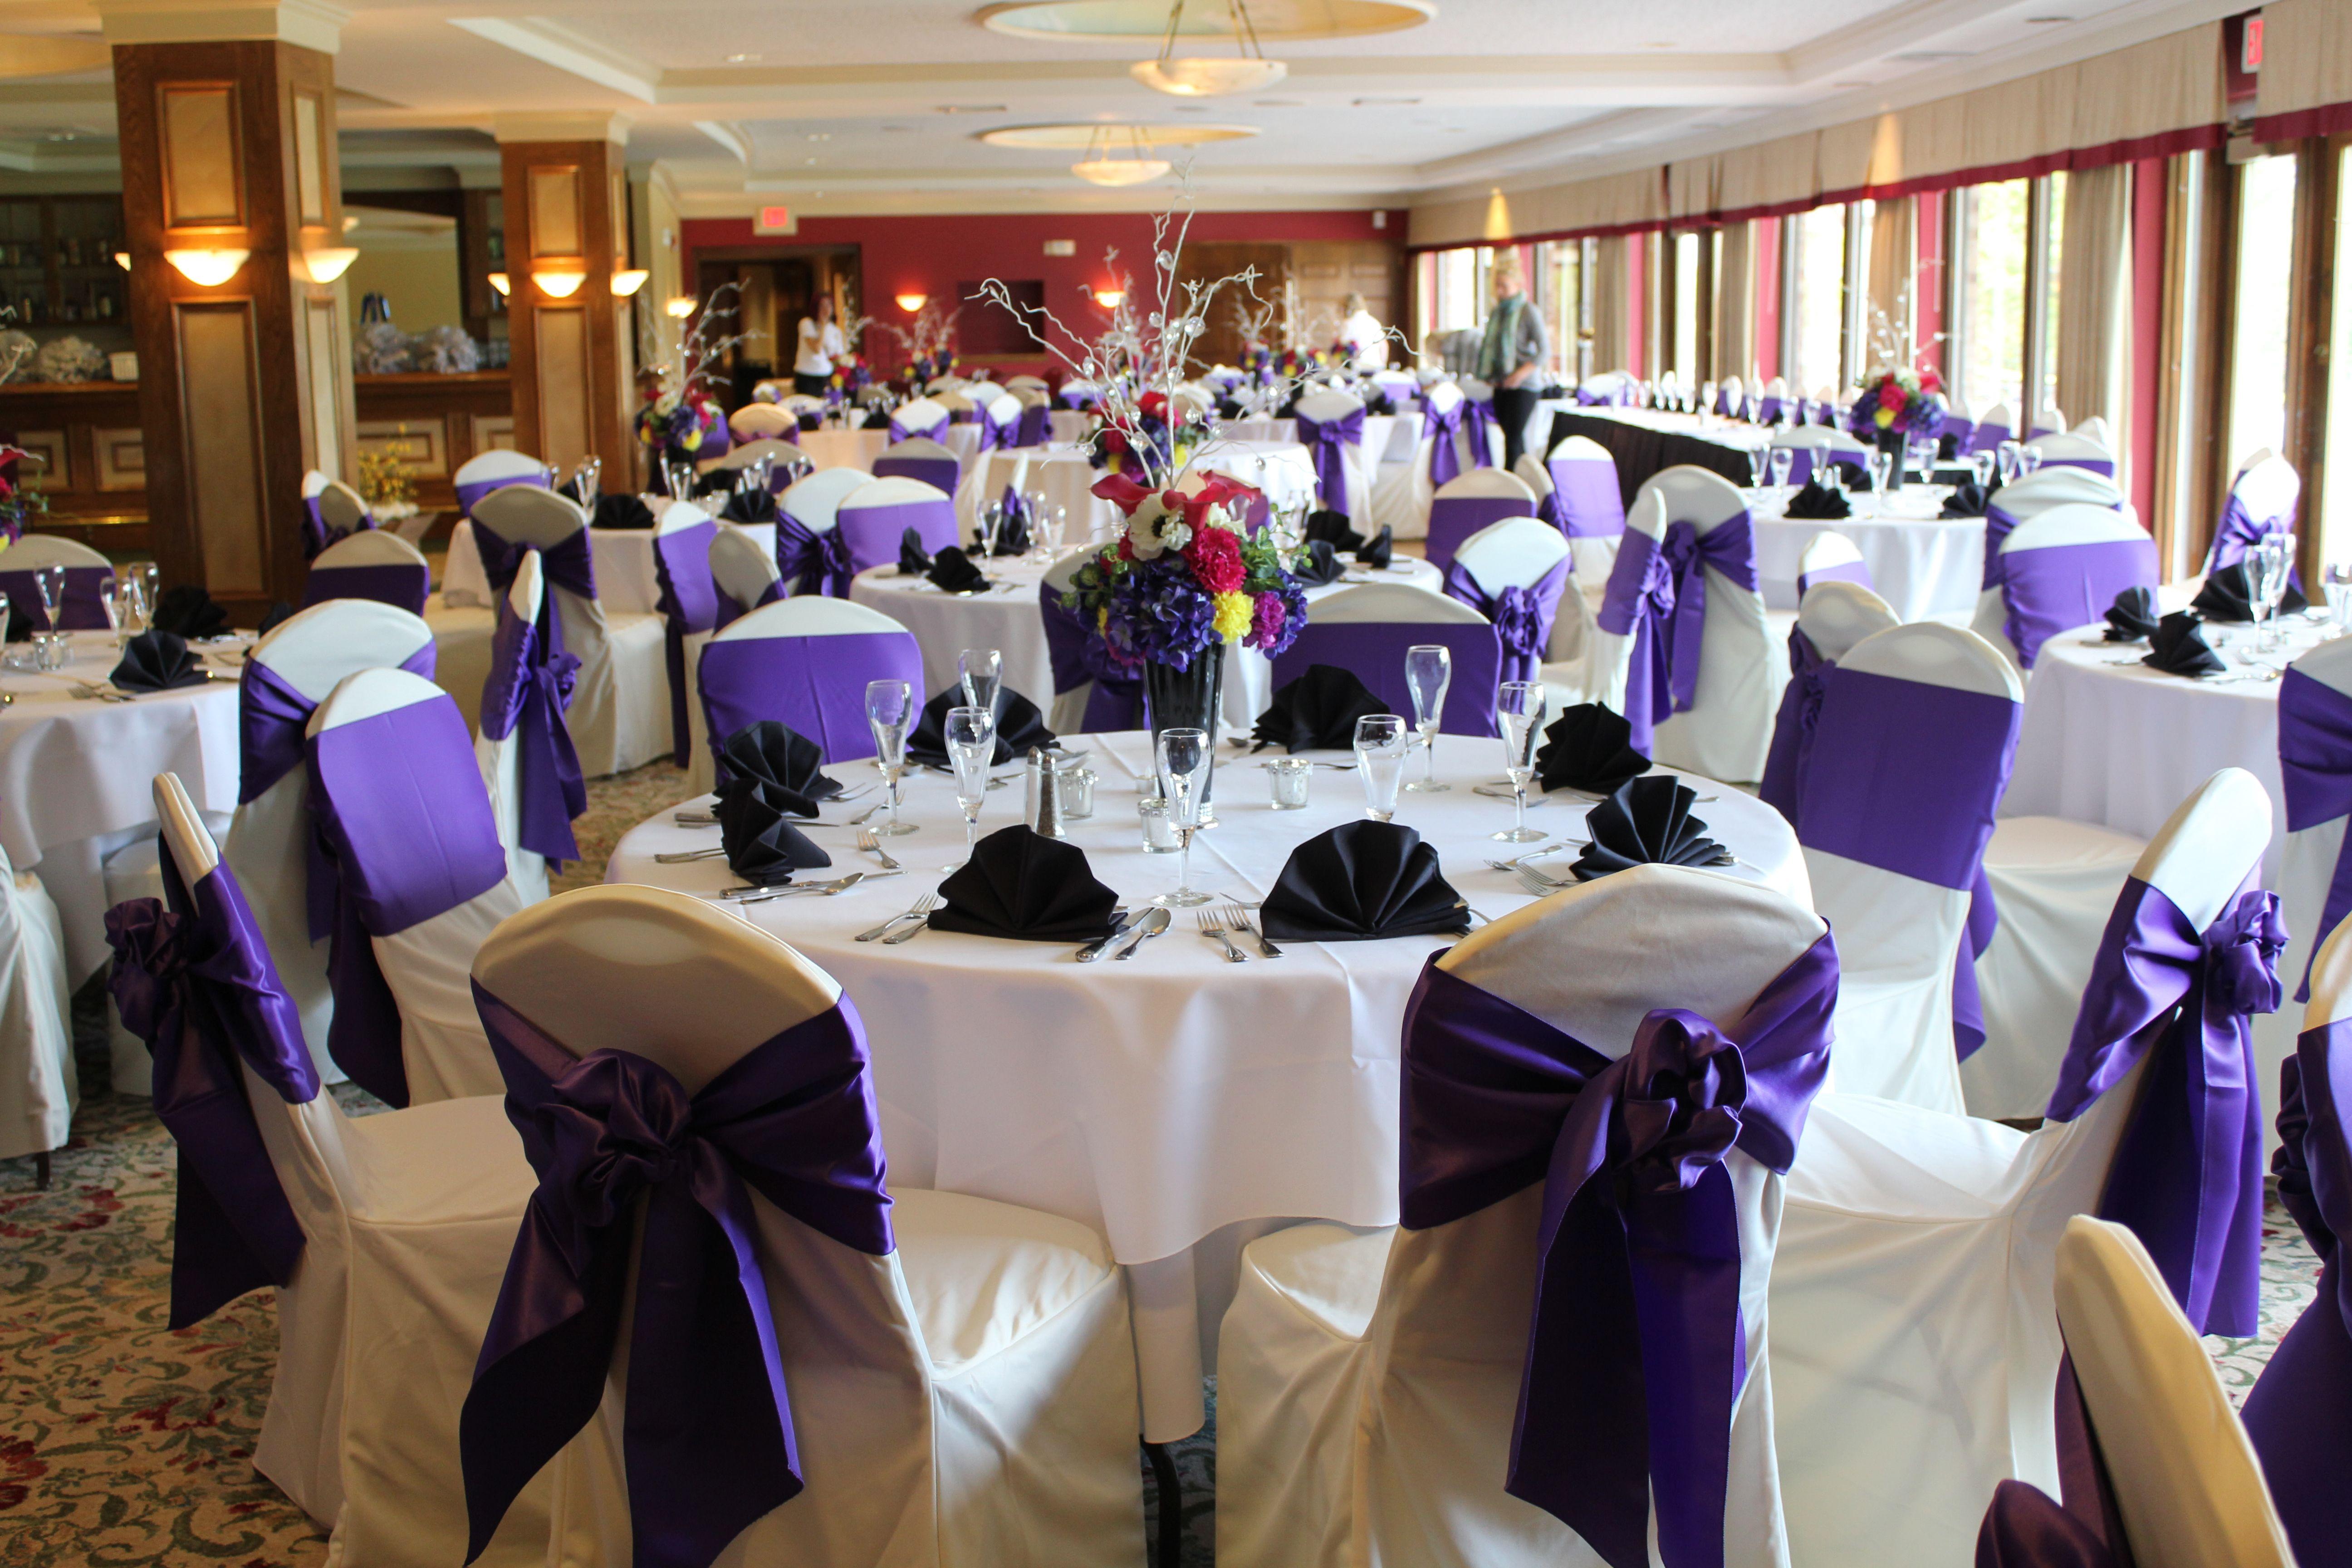 Midwest Wedding Partyrental Allstarrental Chivarichair Chivarichairrental Windlake Muskego Linen Linen With Images Luxury Chair Covers Event Rental Party Rentals